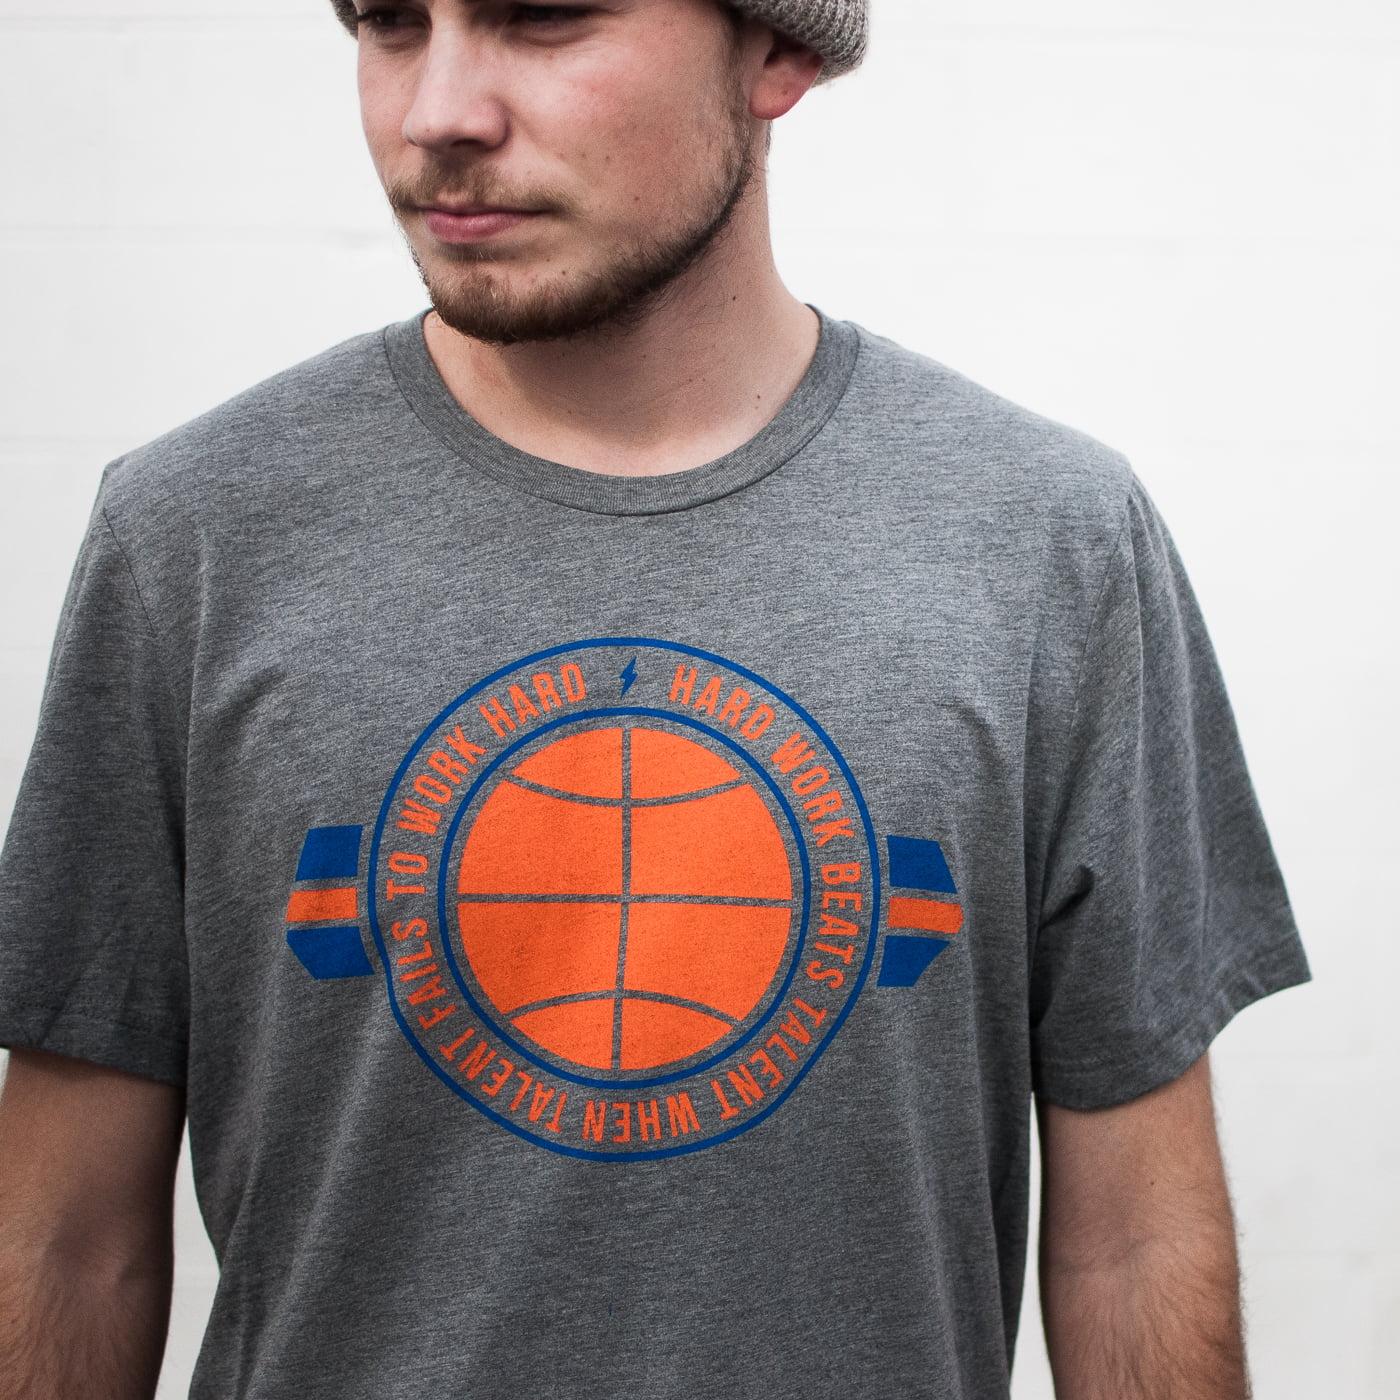 Unisex Men and Women KD Hard Work Tee Shirt OKC Oklahoma City Adult Grey Triblend by Shop Good by Shop Good